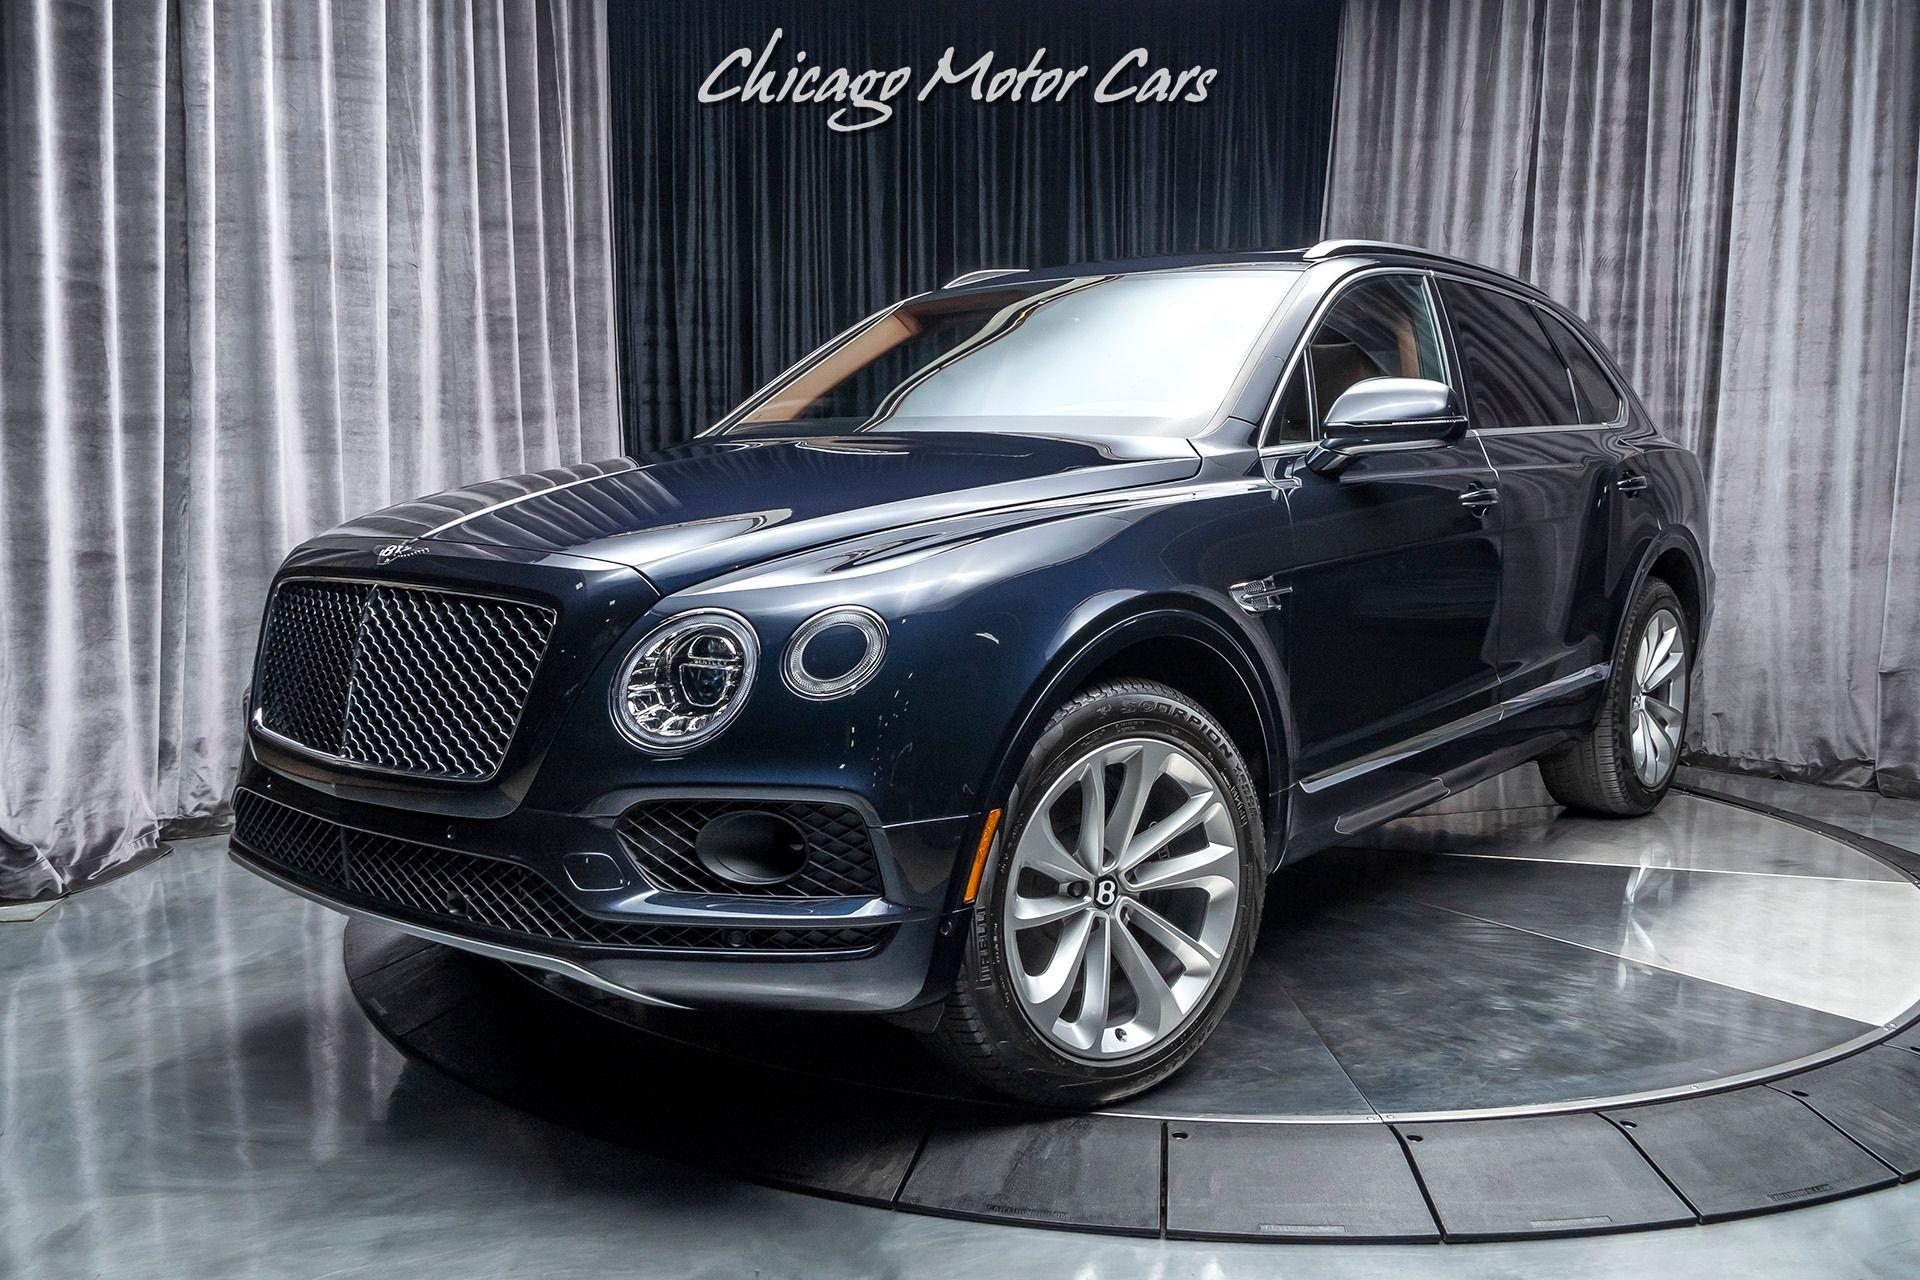 2019 Bentley Bentayga V8 Chicago Motor Cars United States For Sale On Luxurypulse Motor Car Luxury Suv Bentley